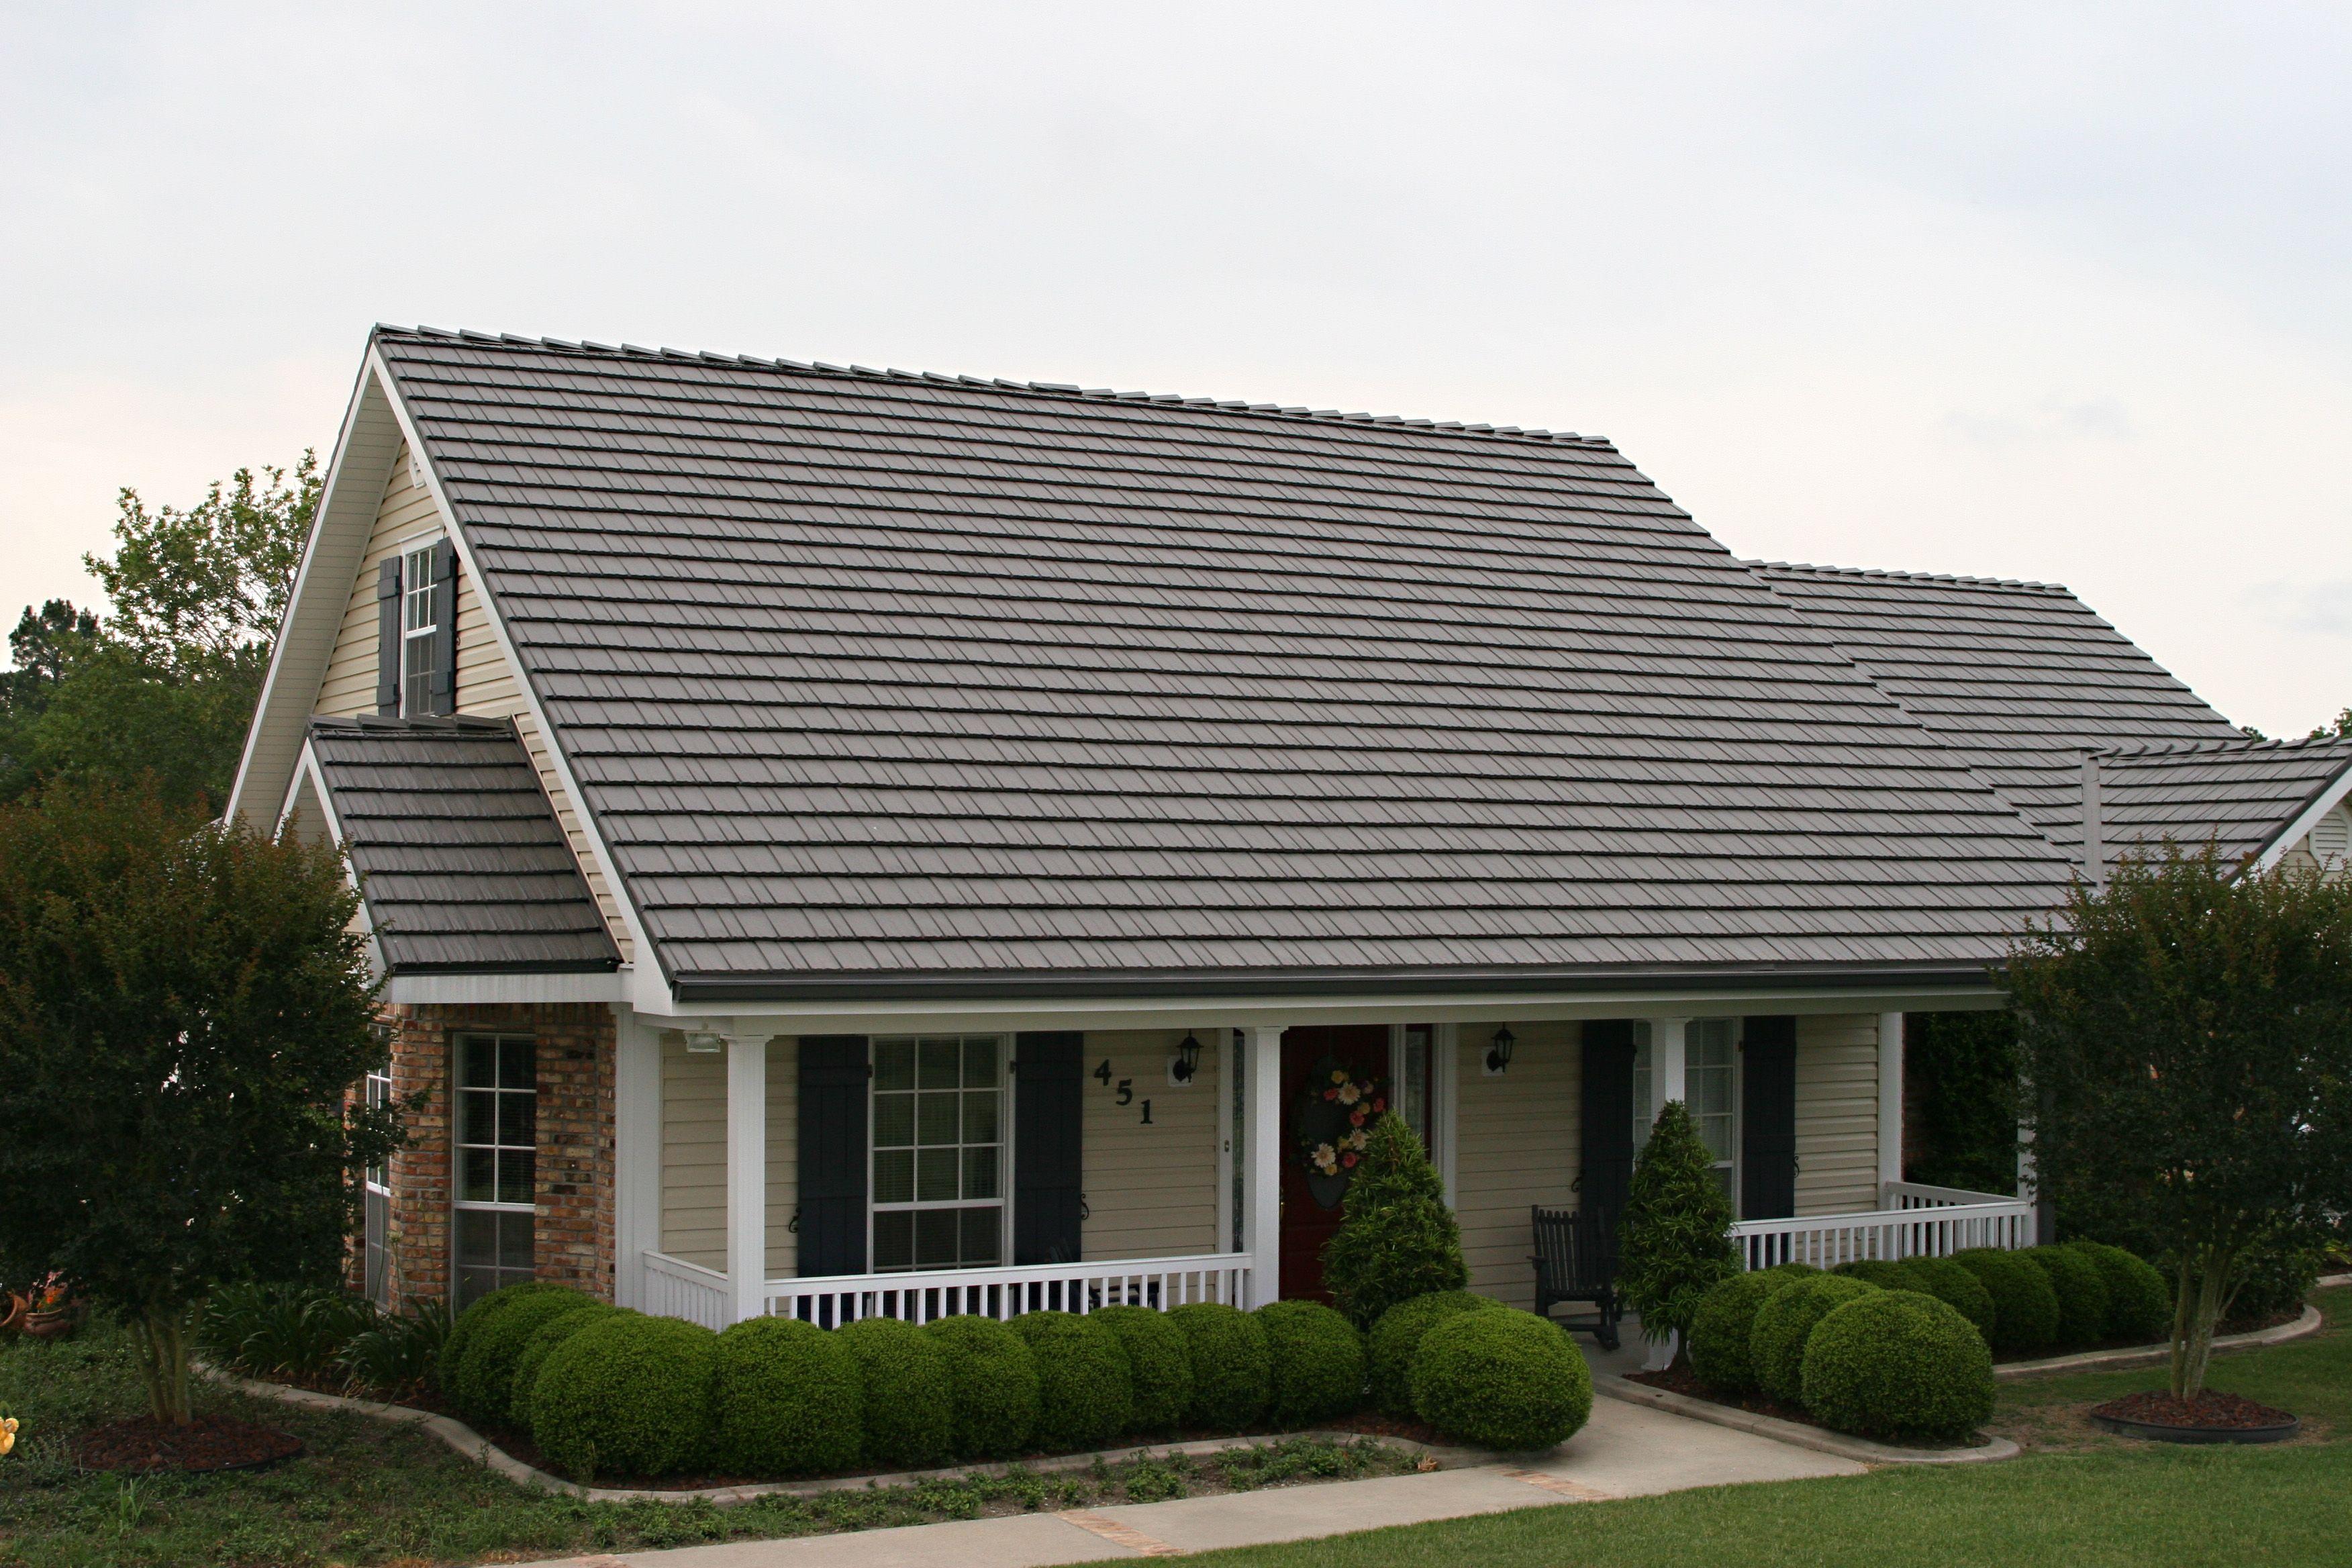 Wood Shake Profile Long Lasting Metal Roof Metal Roof Houses Metal Shingle Roof Metal Roofing Prices